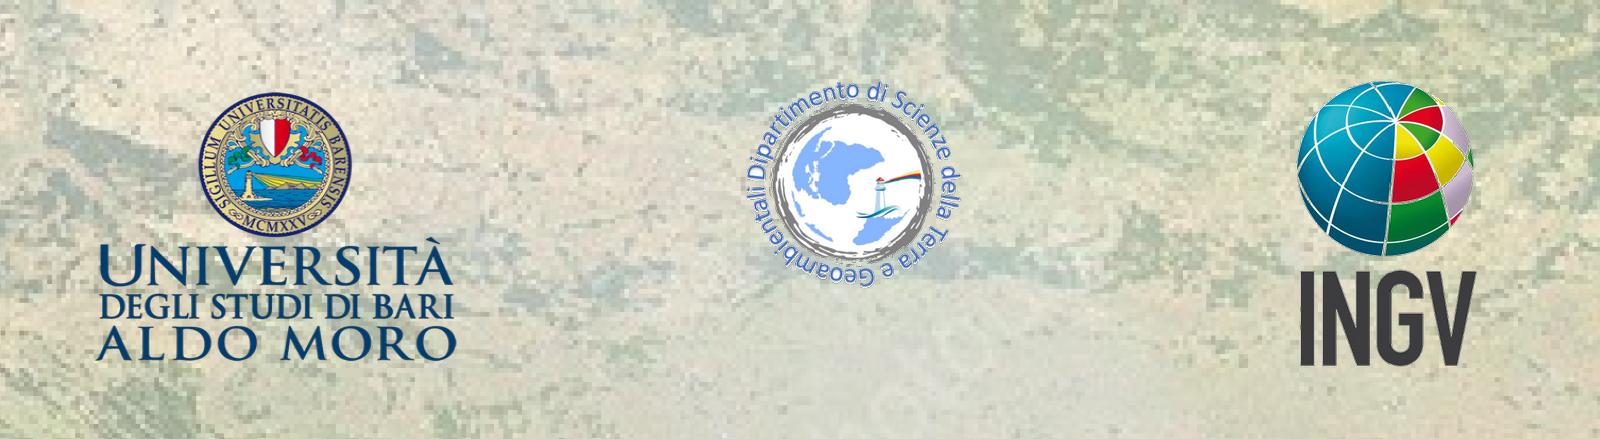 Short Course - Lithosphere Dynamics and Tectonics of Sedimentary Basins